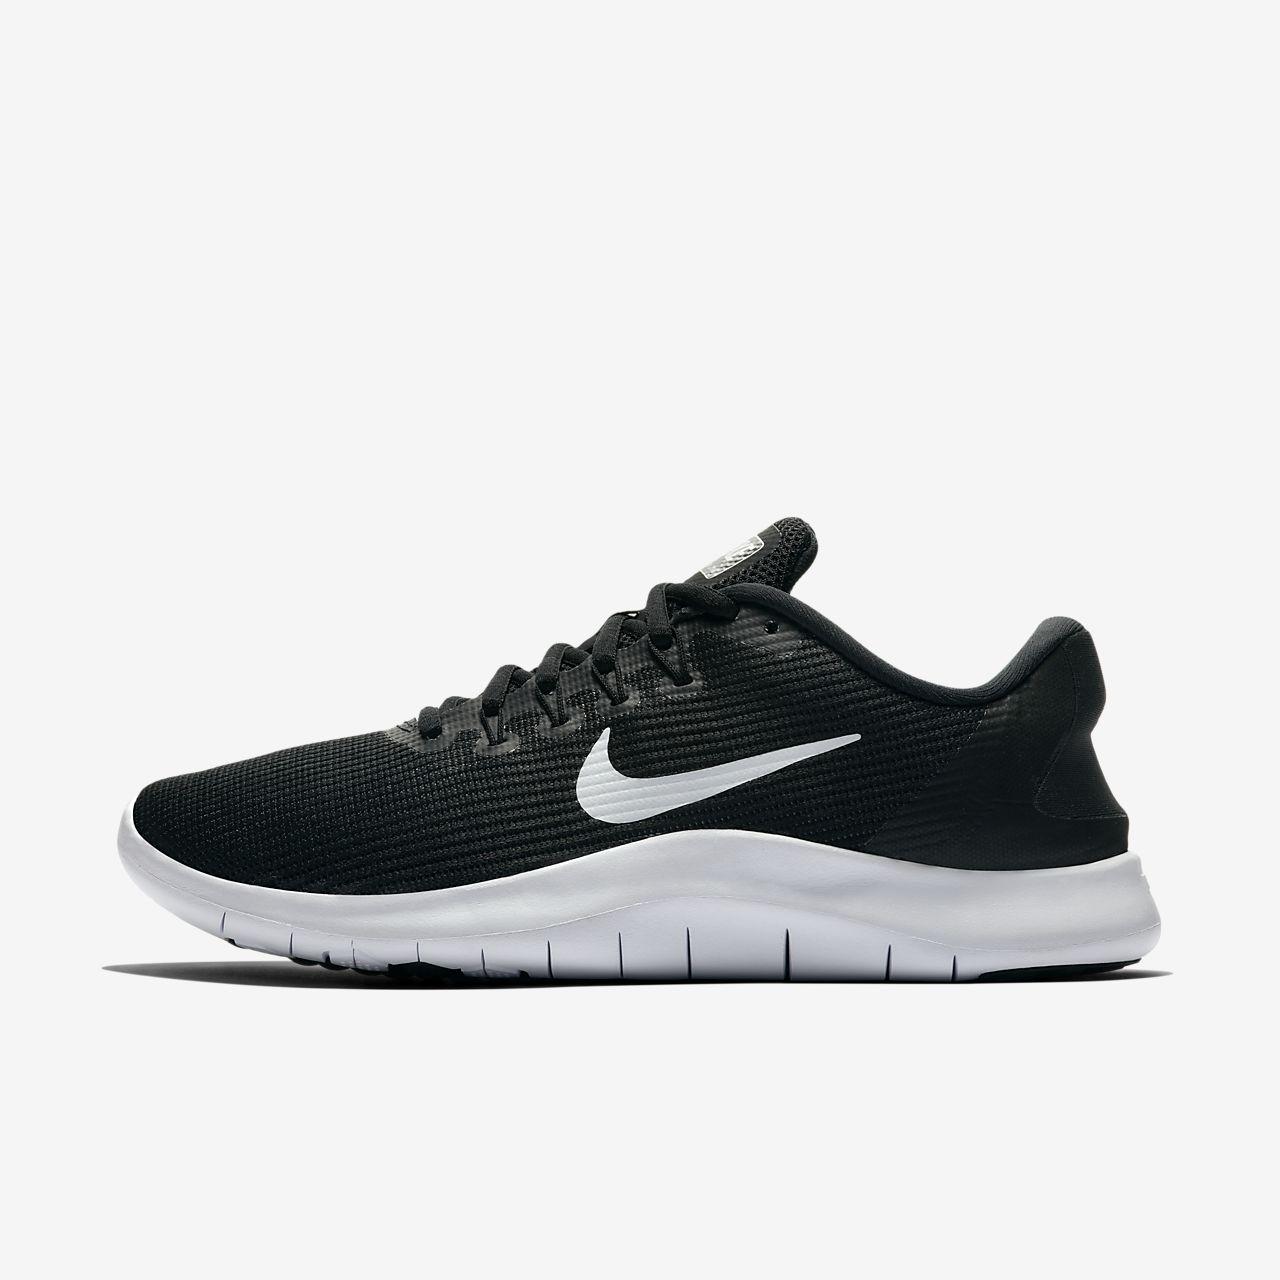 pretty nice 68d9d d1e56 ... Scarpa da running Nike Flex RN 2018 - Donna